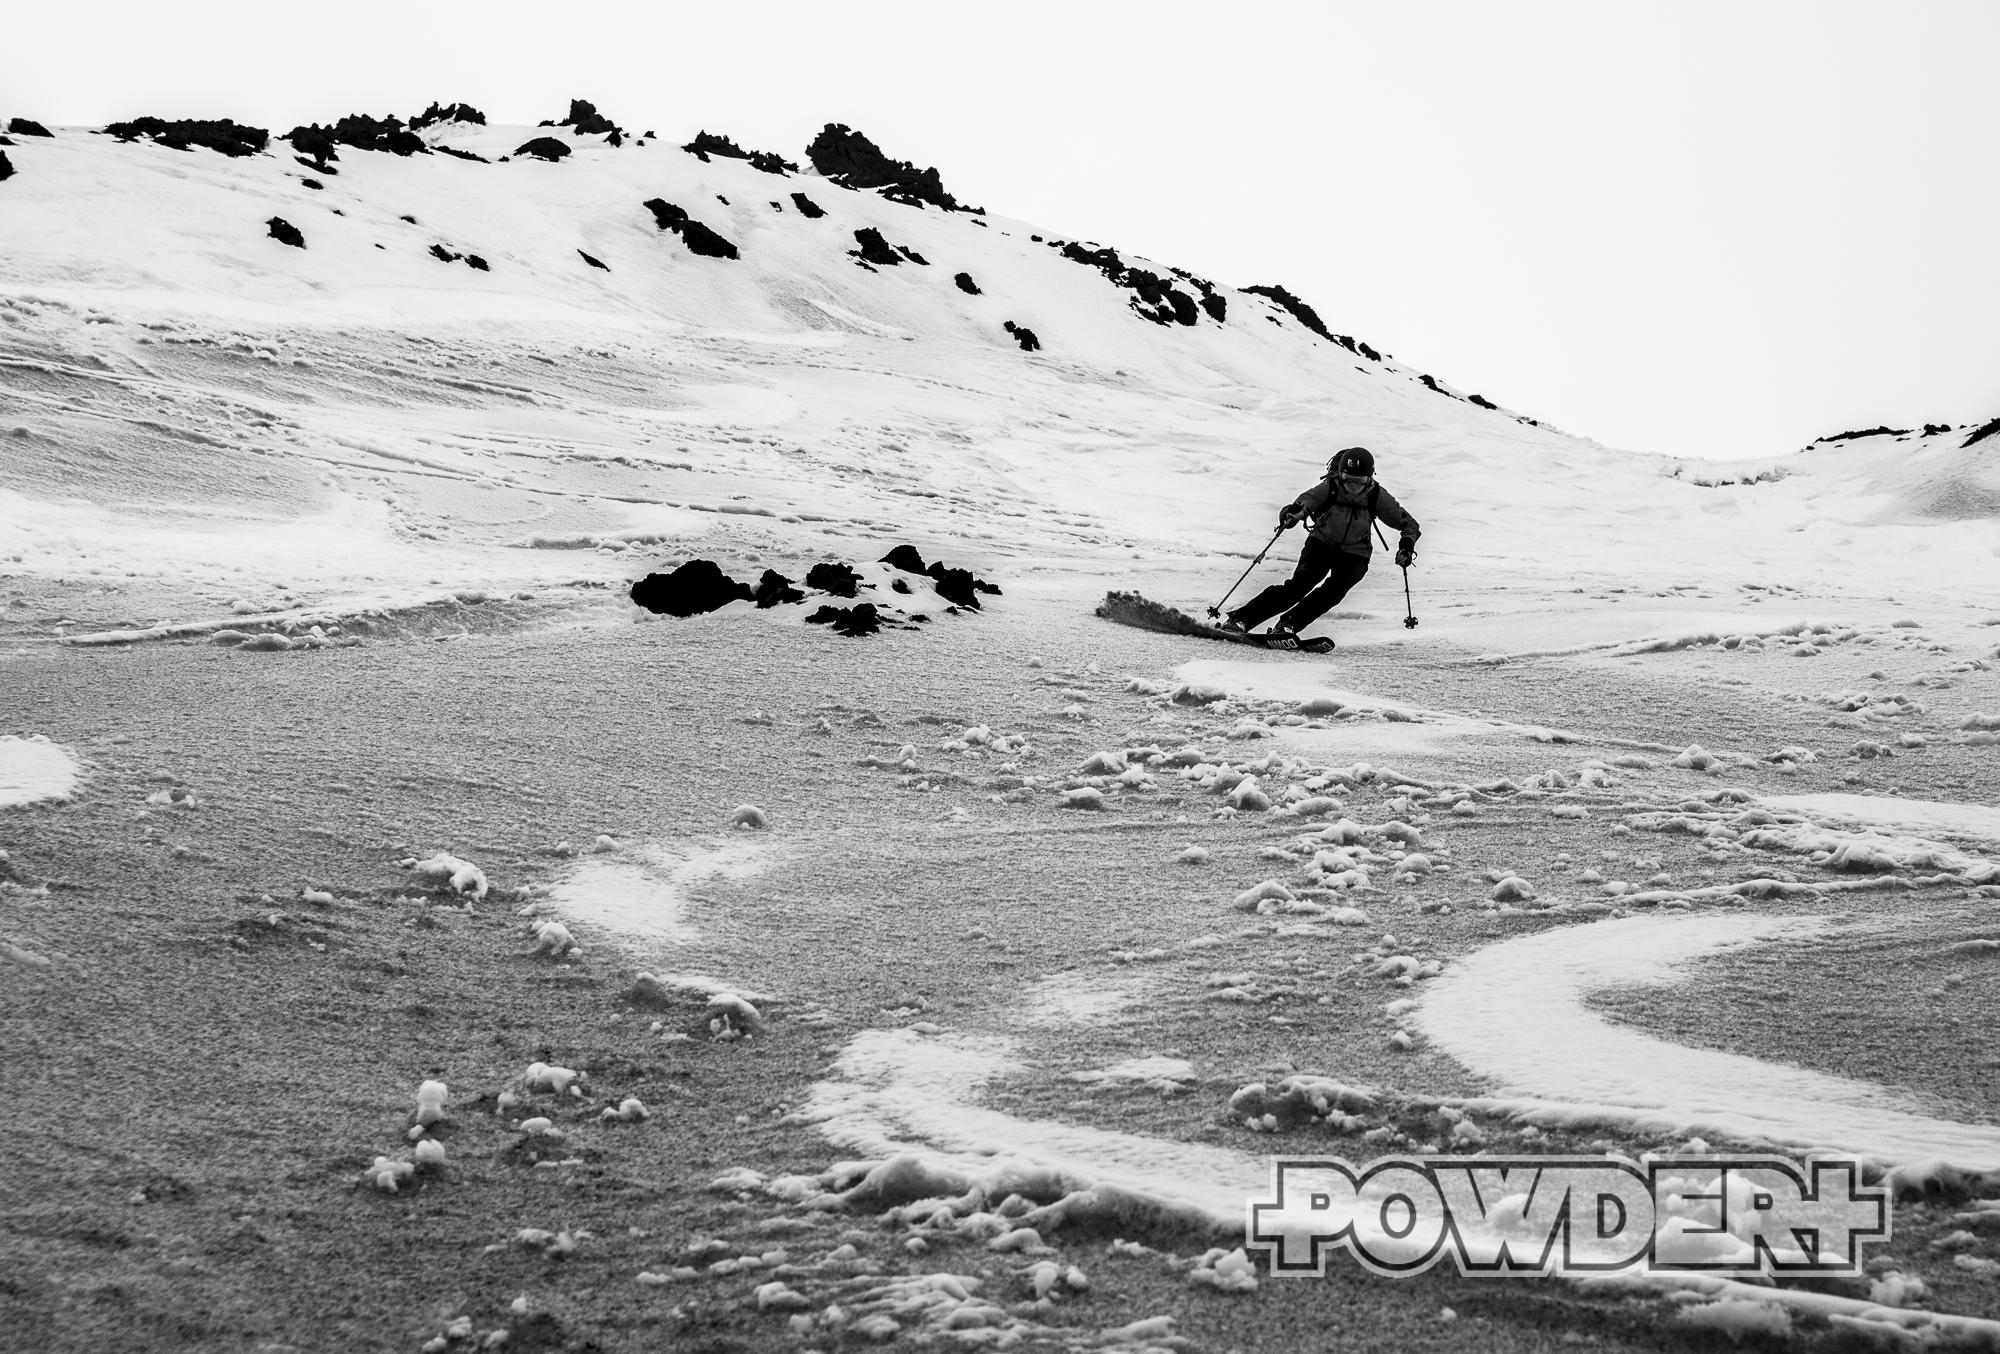 Freeride Skitour Ätna, ätna, sizilien, freeride, skitour, skitouring, schwarze materie, skitour ätna,etna, freeride ätna